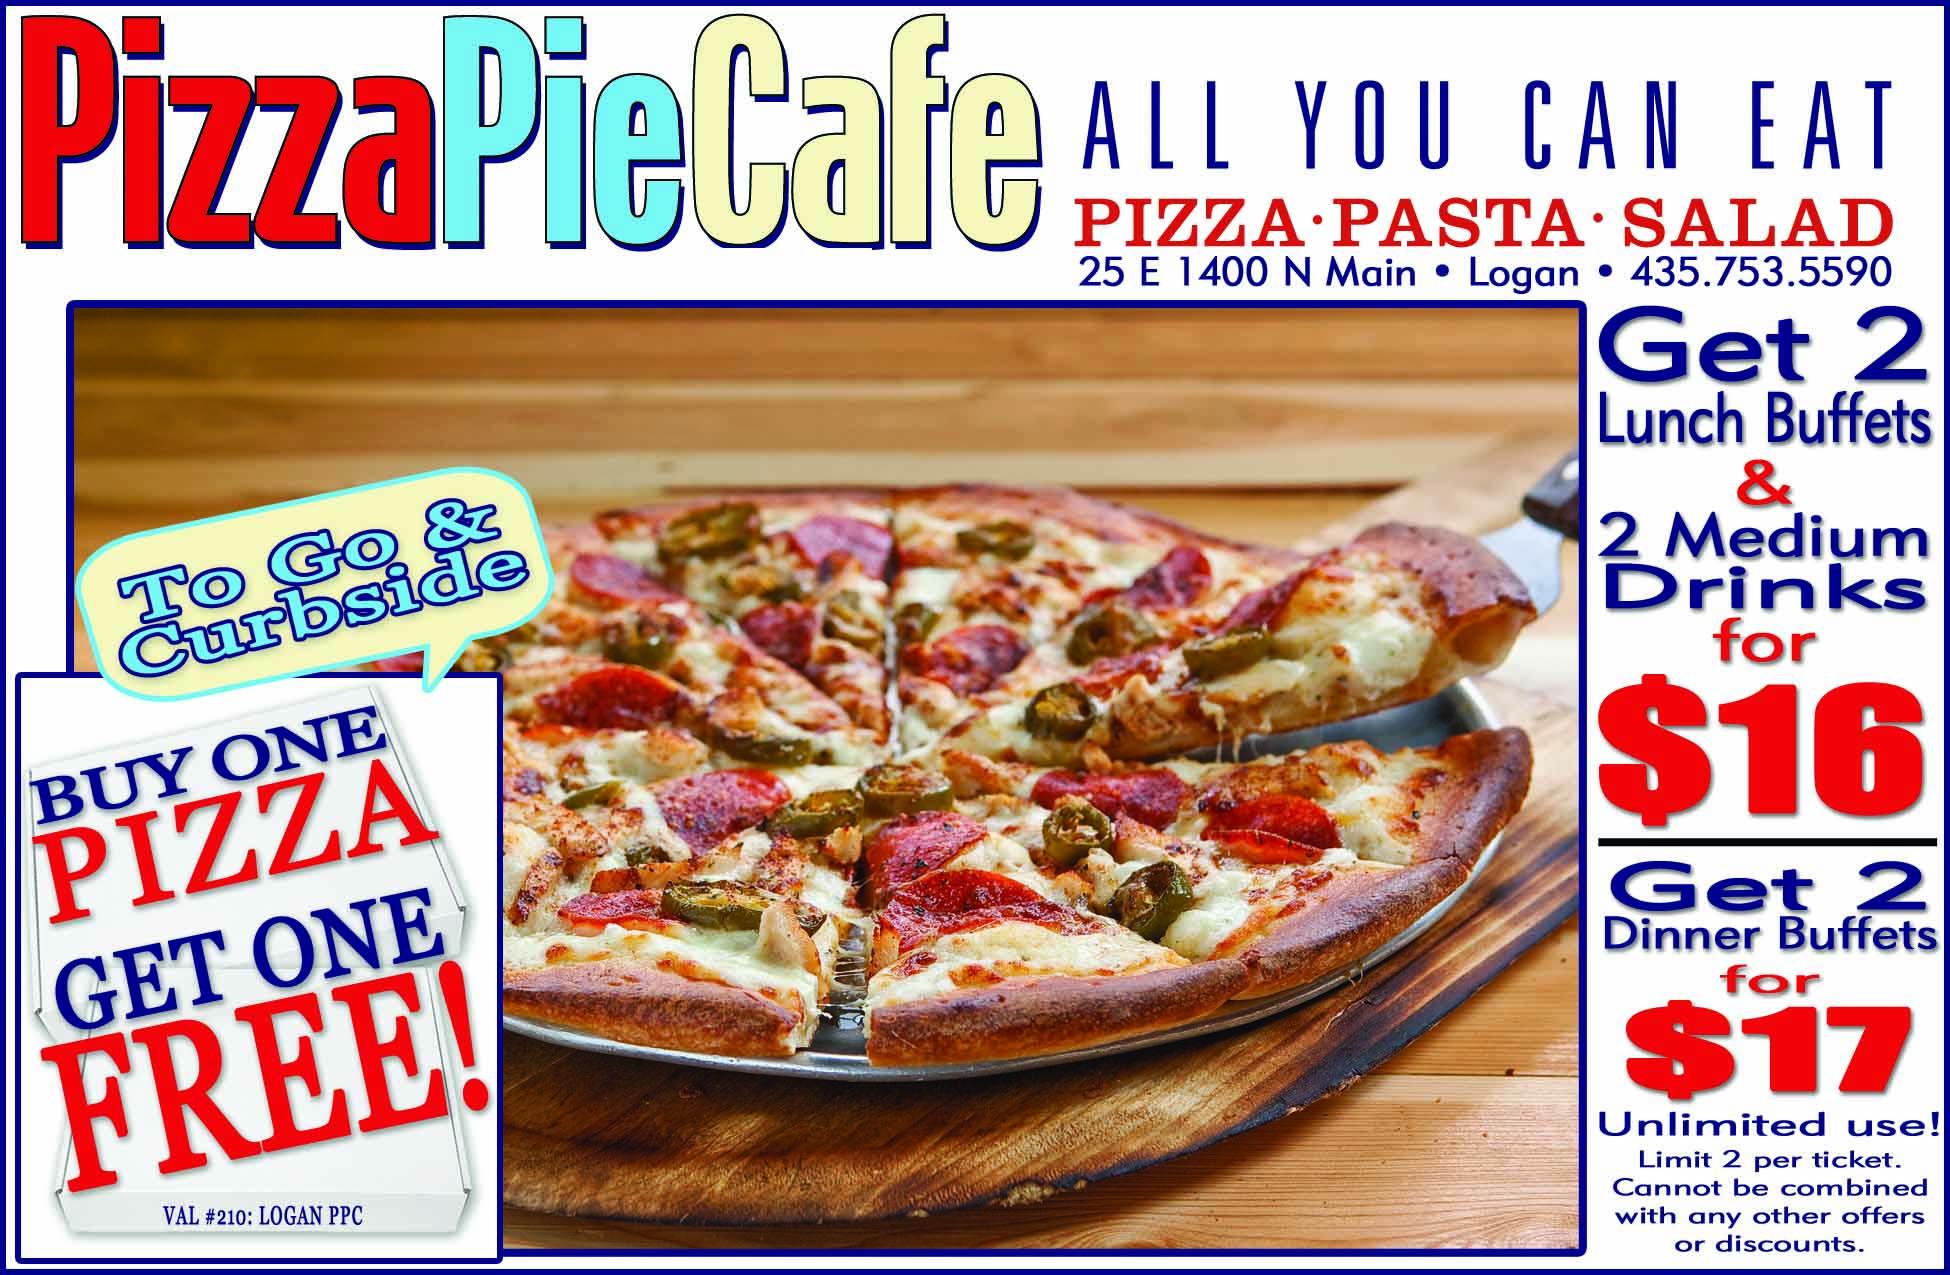 Pizza Pie Cafe Logan